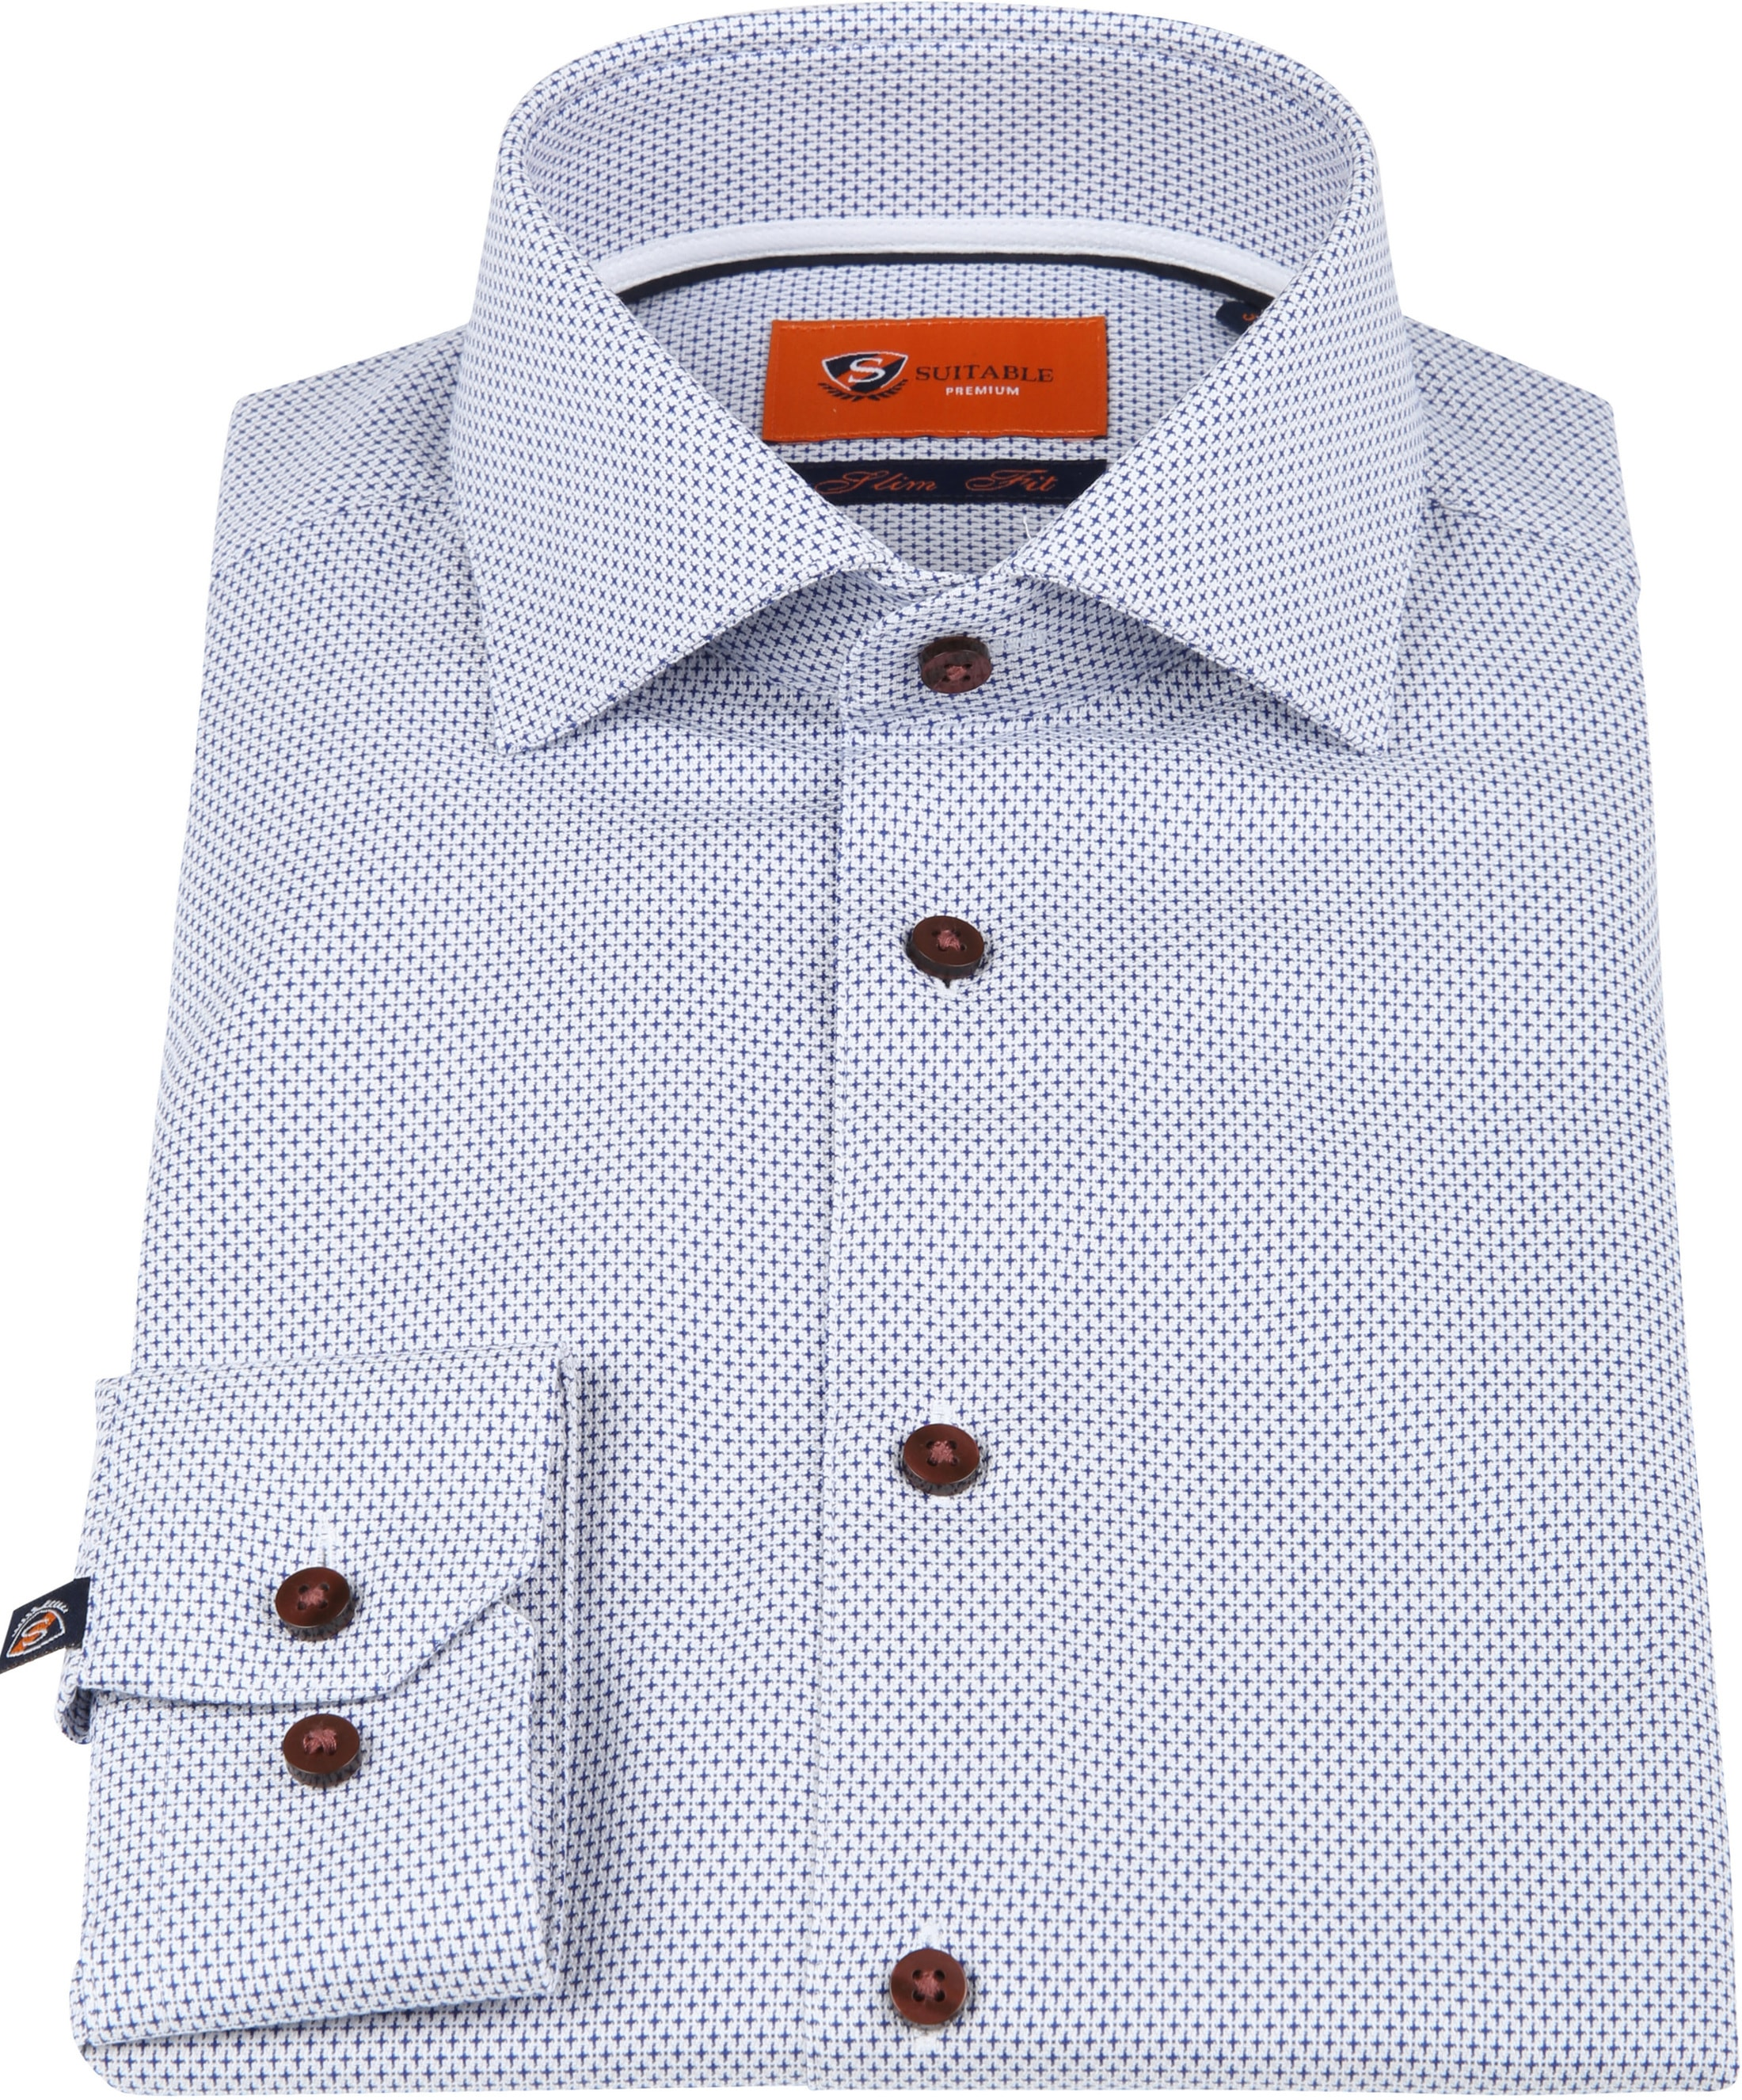 Suitable Overhemd Blauw Dessin D82-20 foto 2